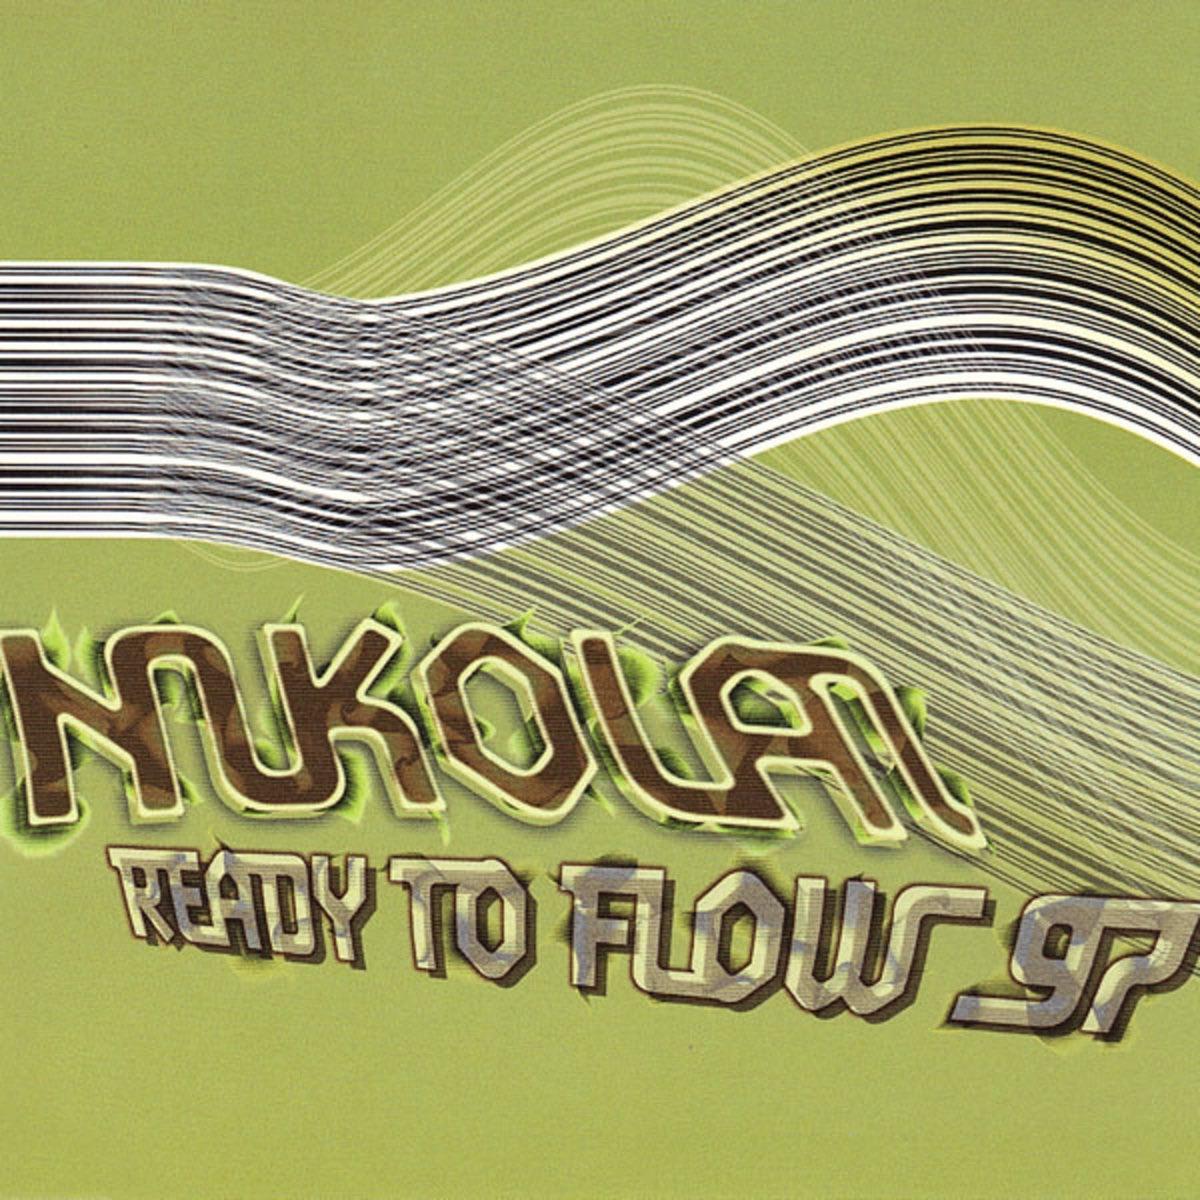 Ready to Flow (Merlyn & Chuck Mellow Mix)